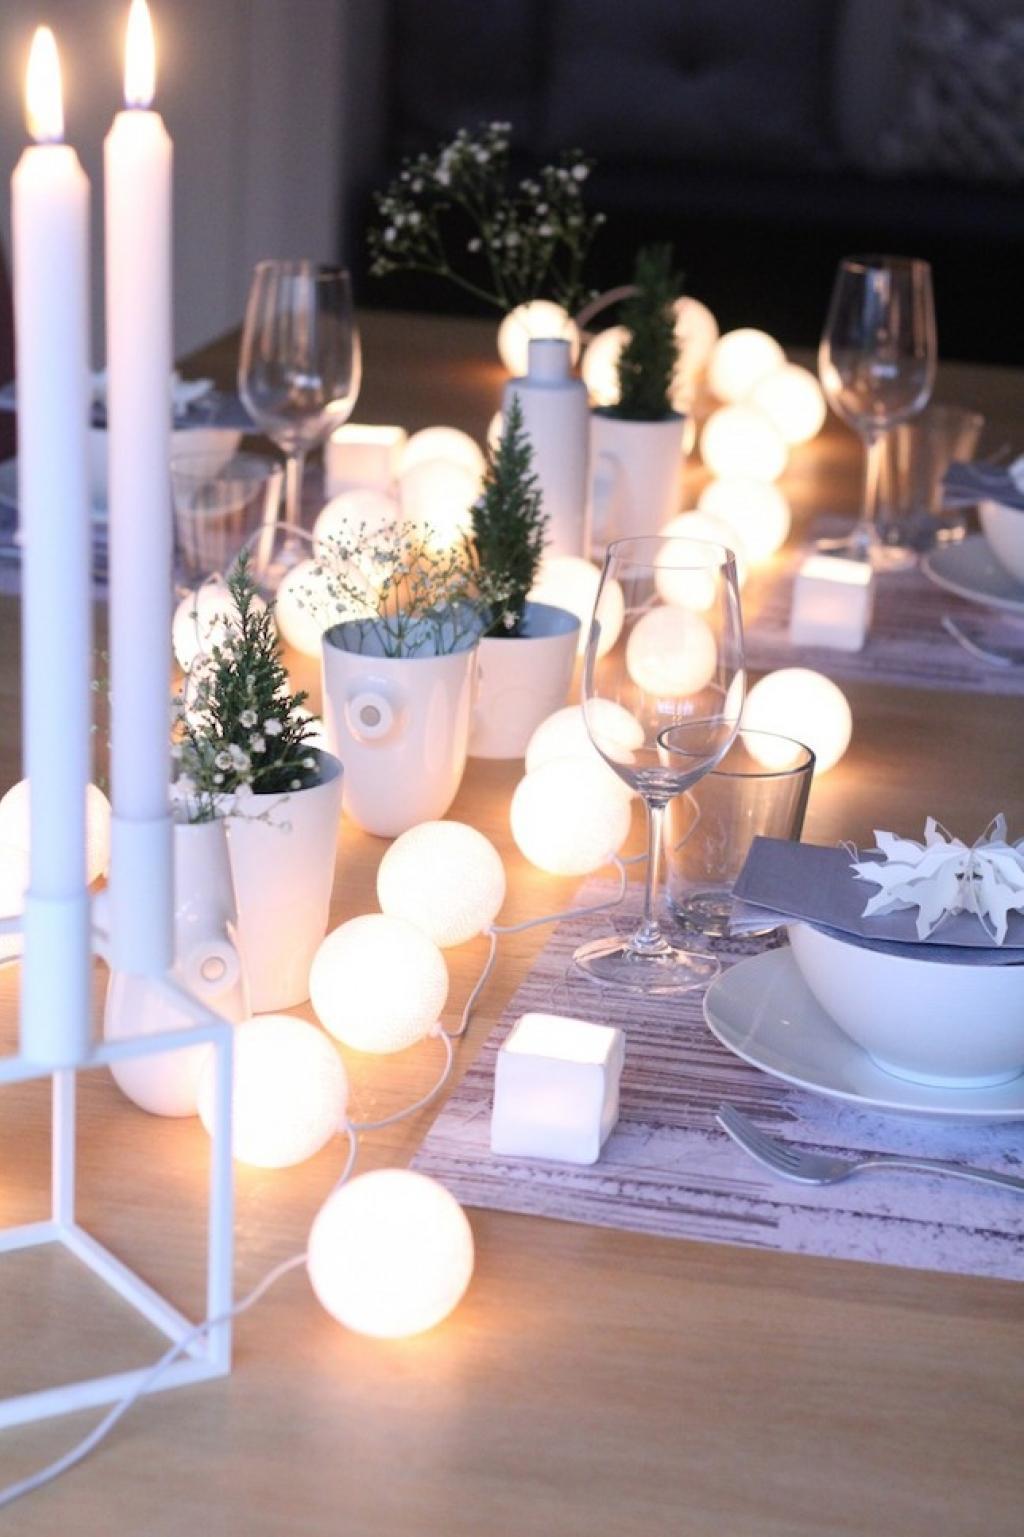 Christmas table decoration diy - Miniature White Christmas